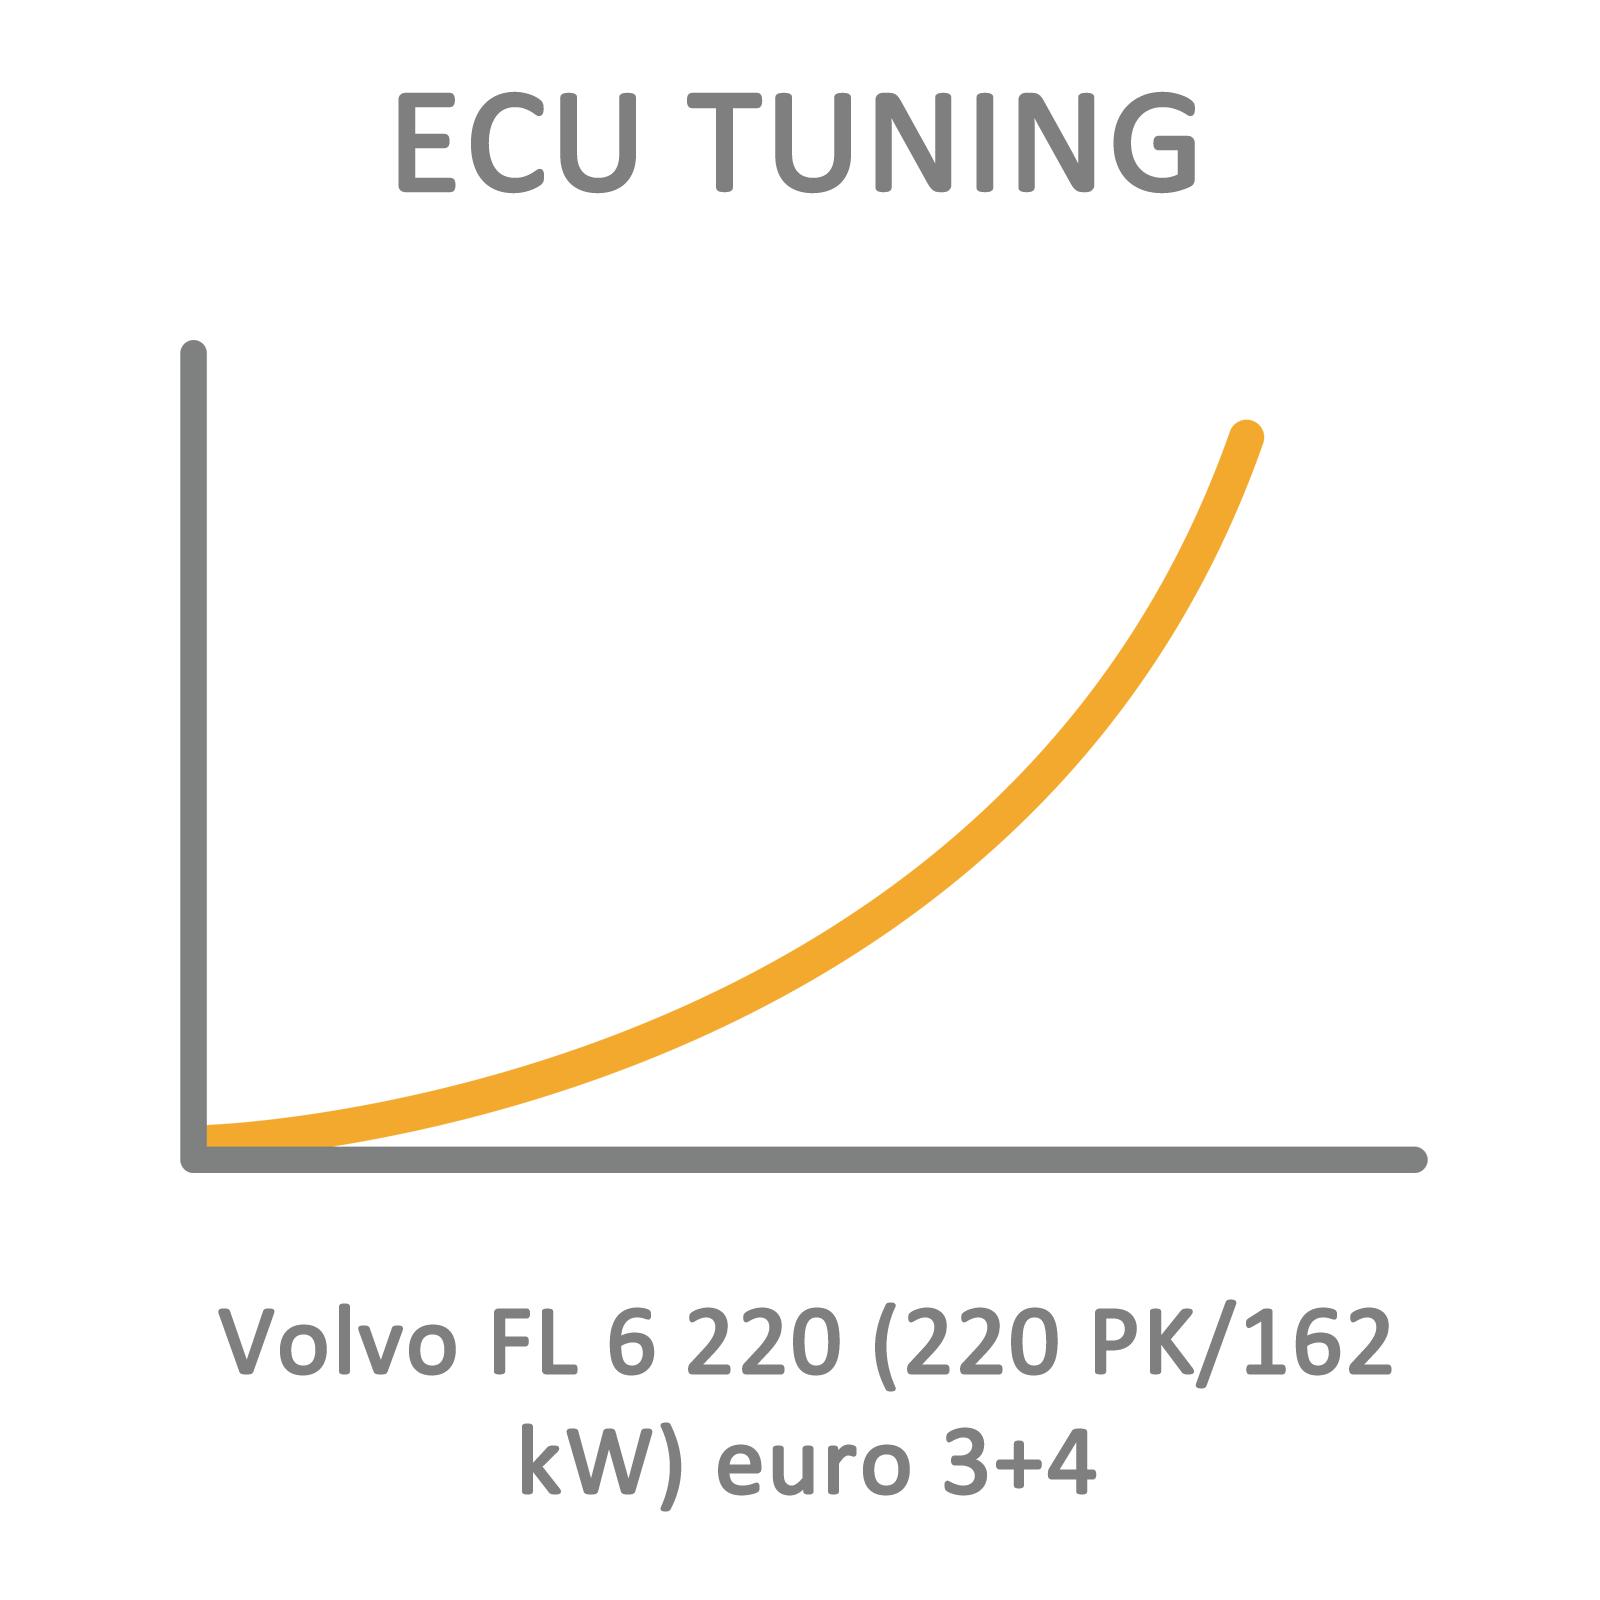 Volvo FL 6 220 (220 PK/162 kW) euro 3+4 ECU Tuning